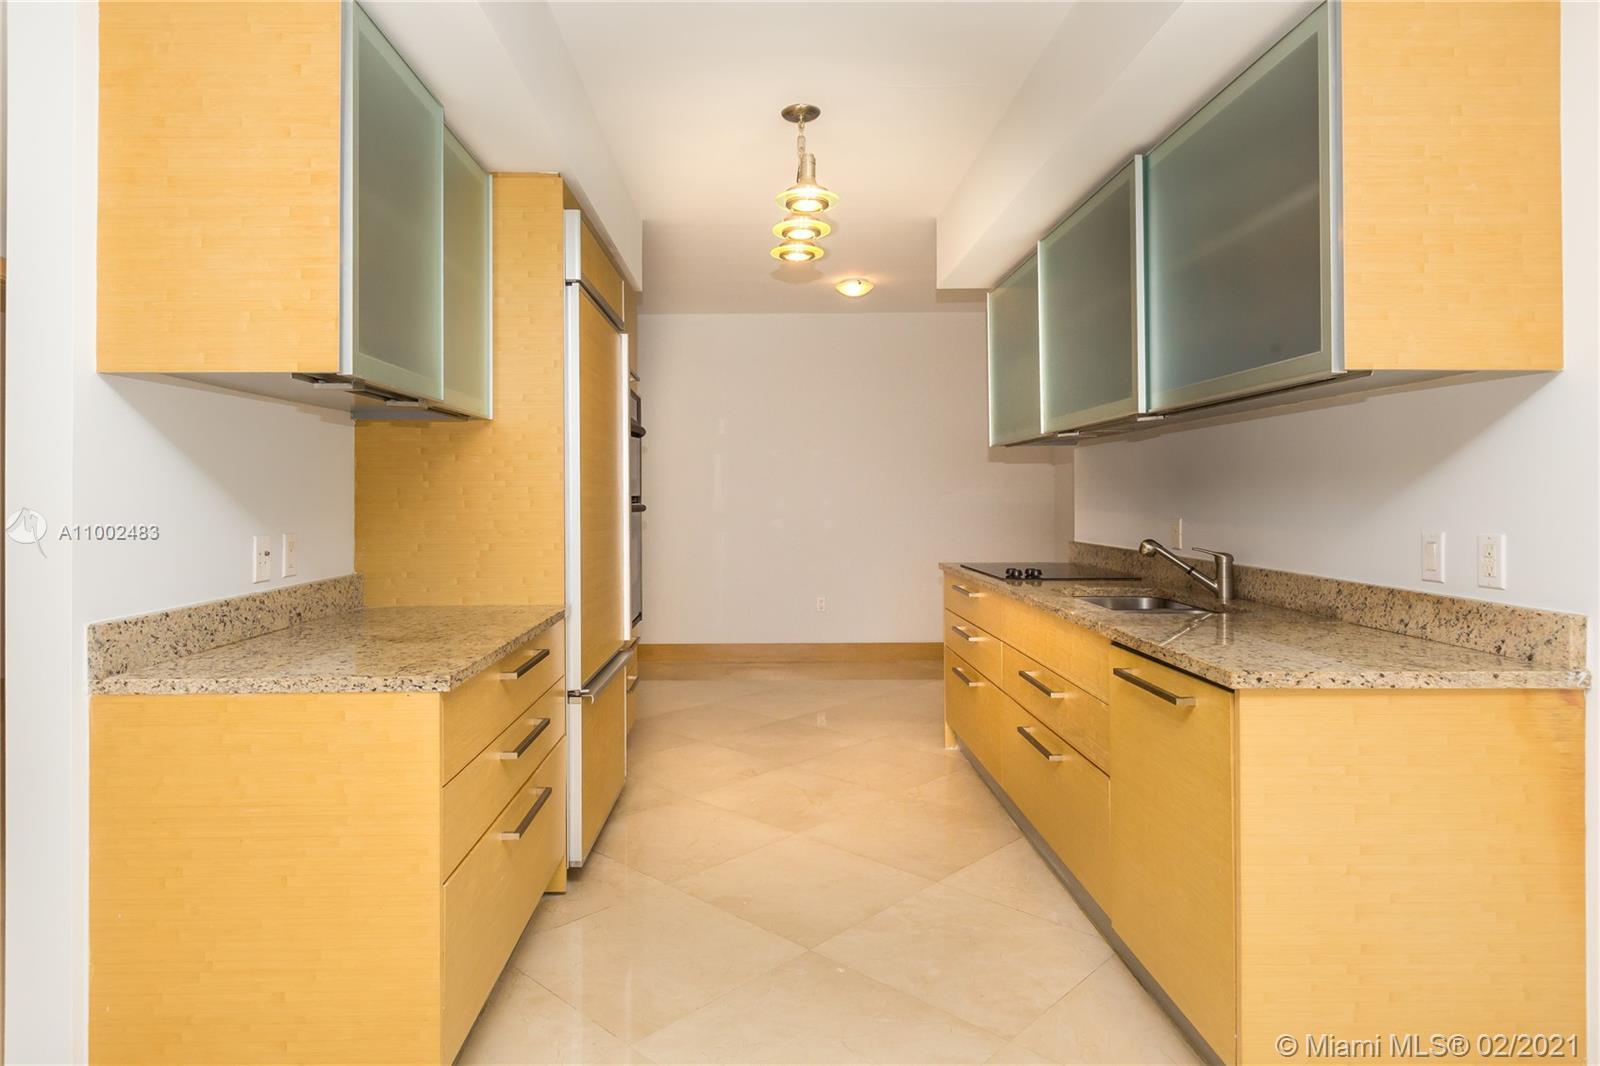 1502 3 / 3 1841 sq. ft. $ 2021-02-21 0 Photo